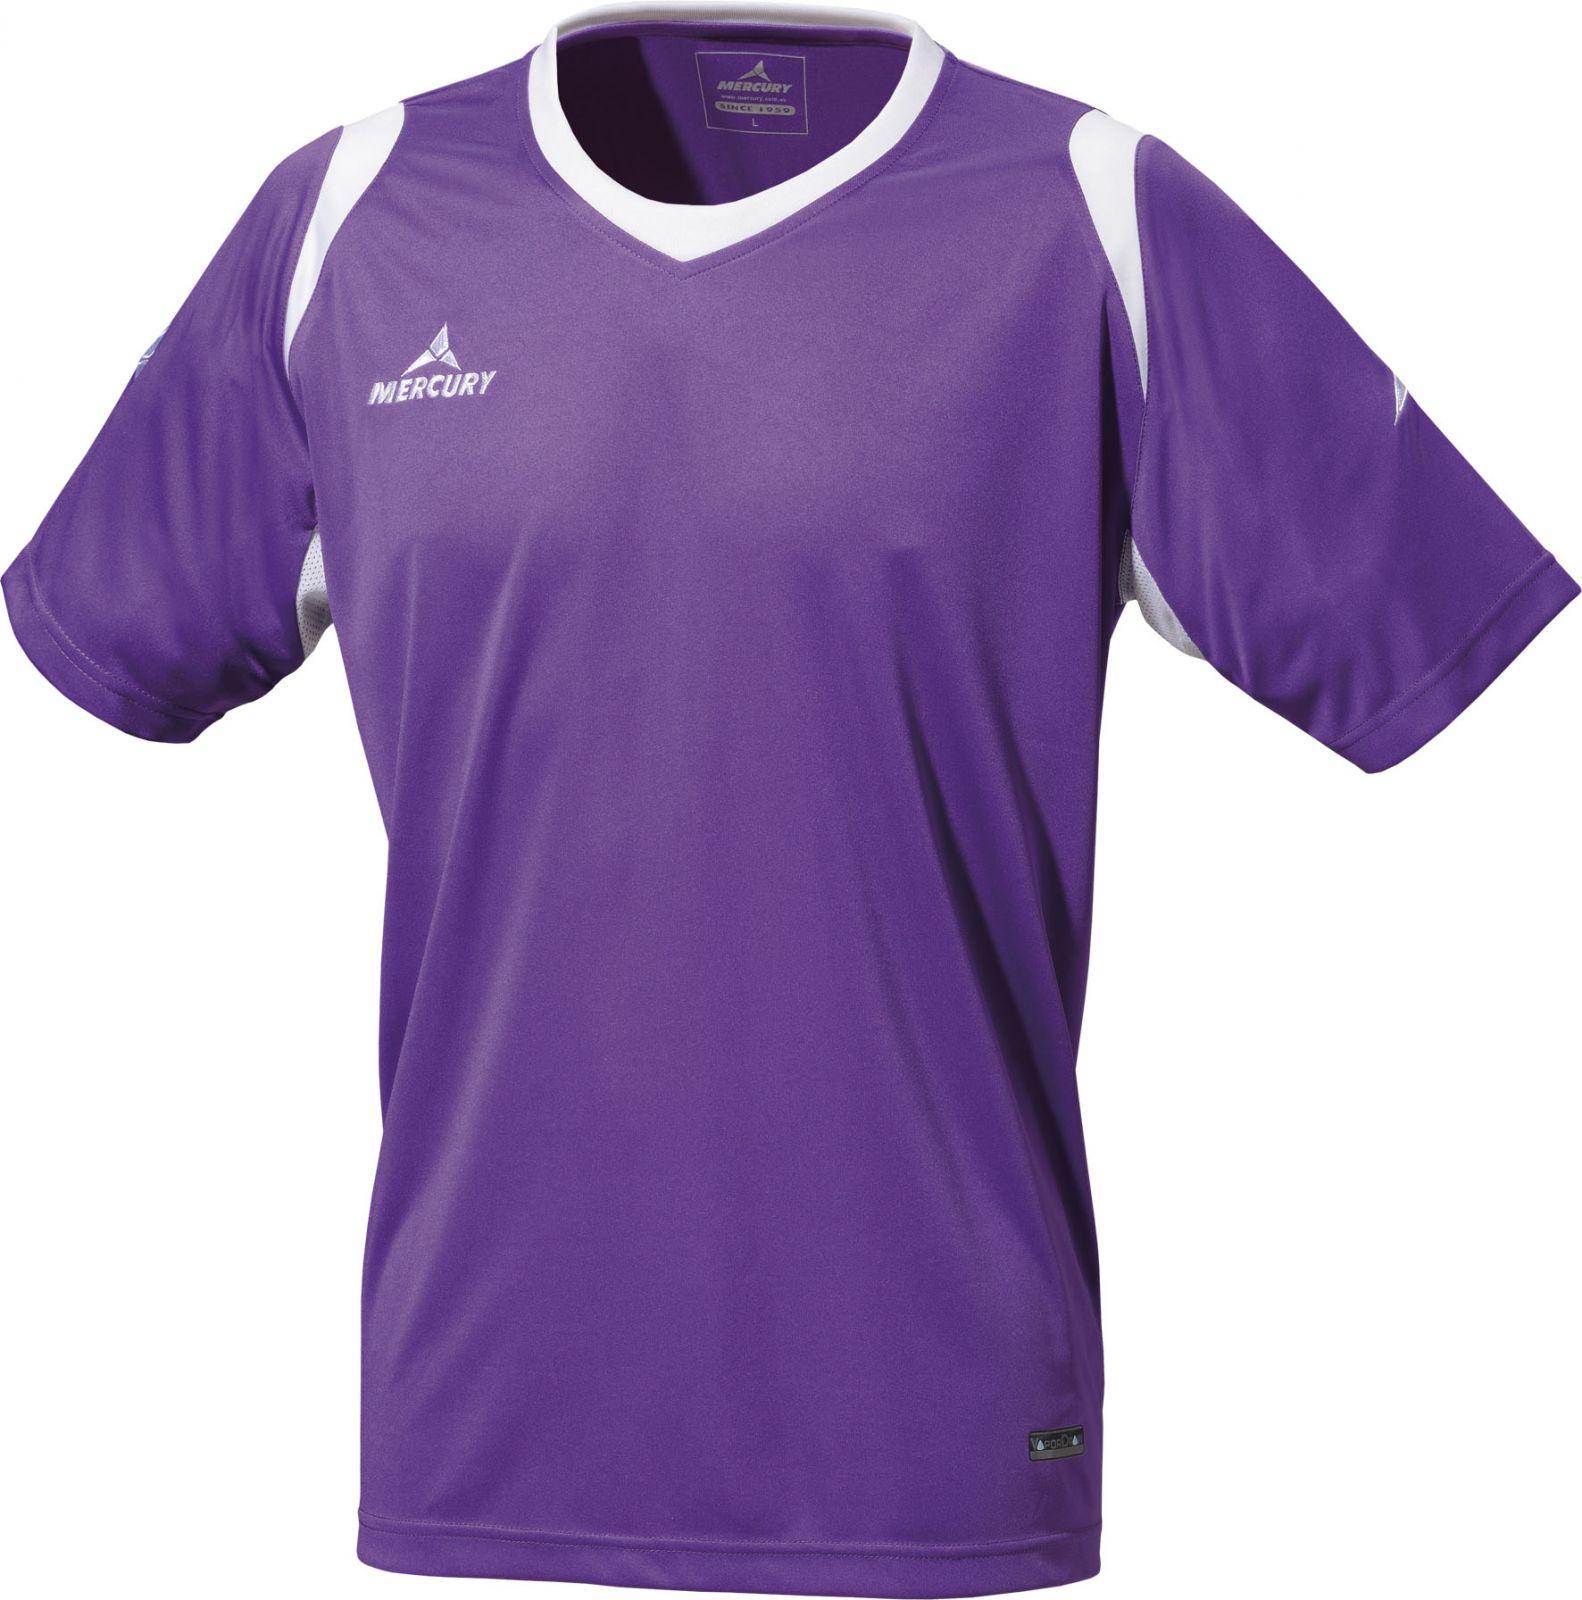 Camiseta Mercury Bundesliga MECCBC 4902